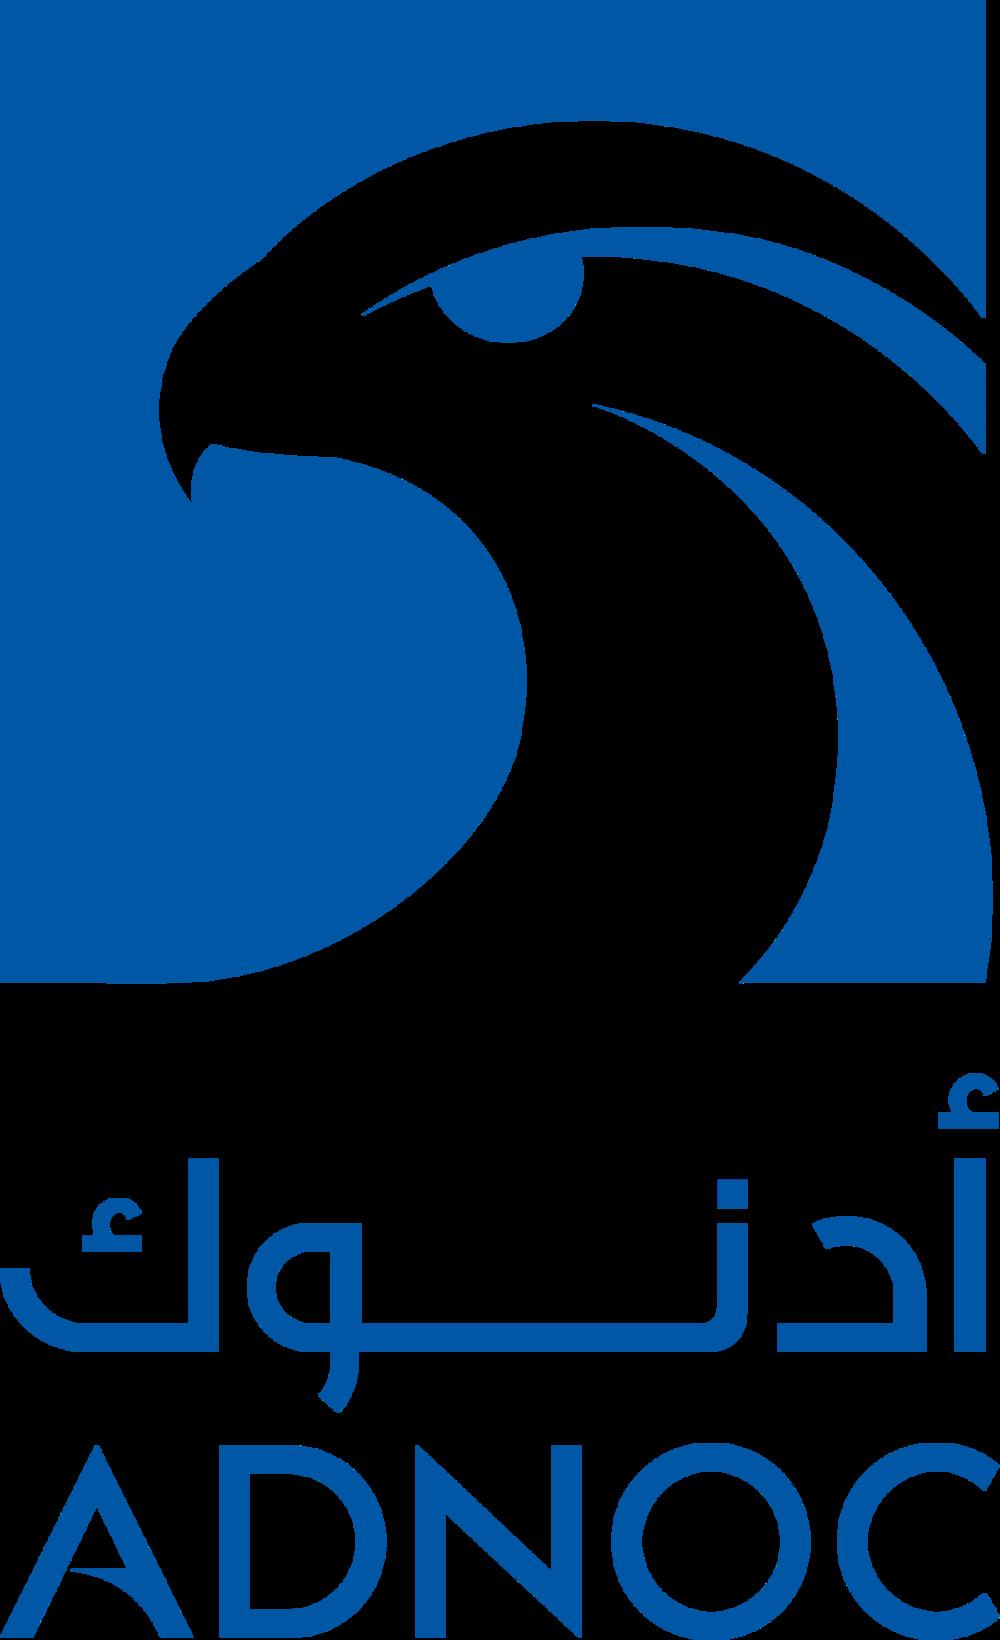 1200px-ADNOC_logo.png